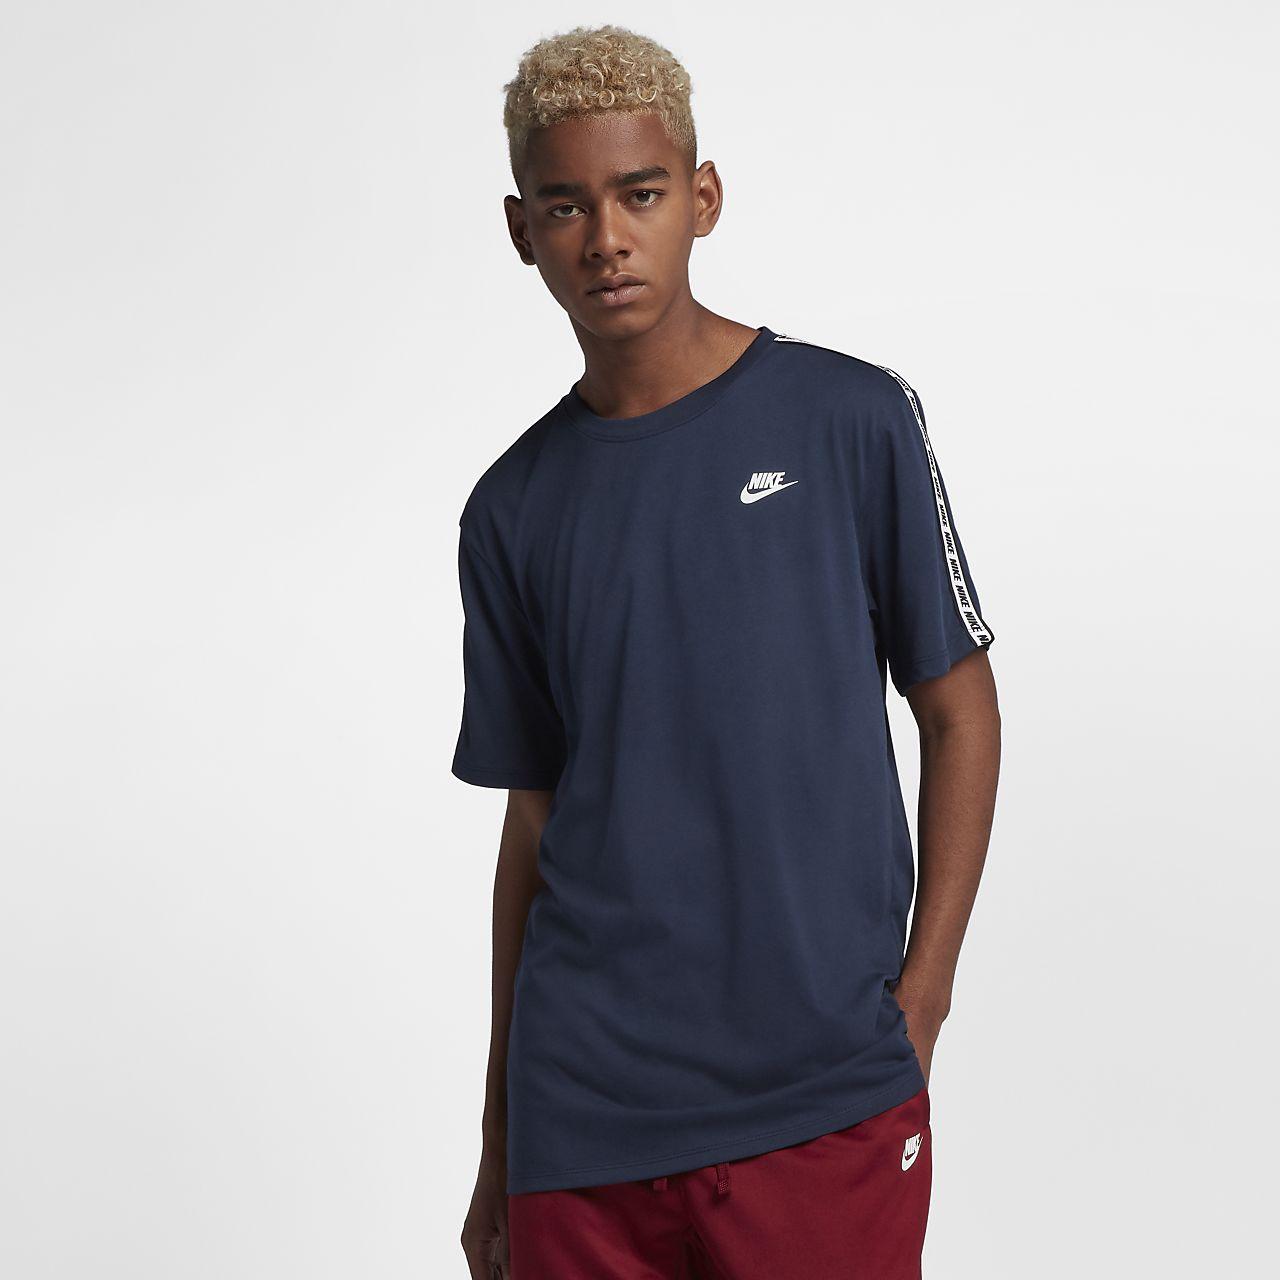 3554b61128c Low Resolution Playera para hombre Nike Sportswear Playera para hombre Nike  Sportswear